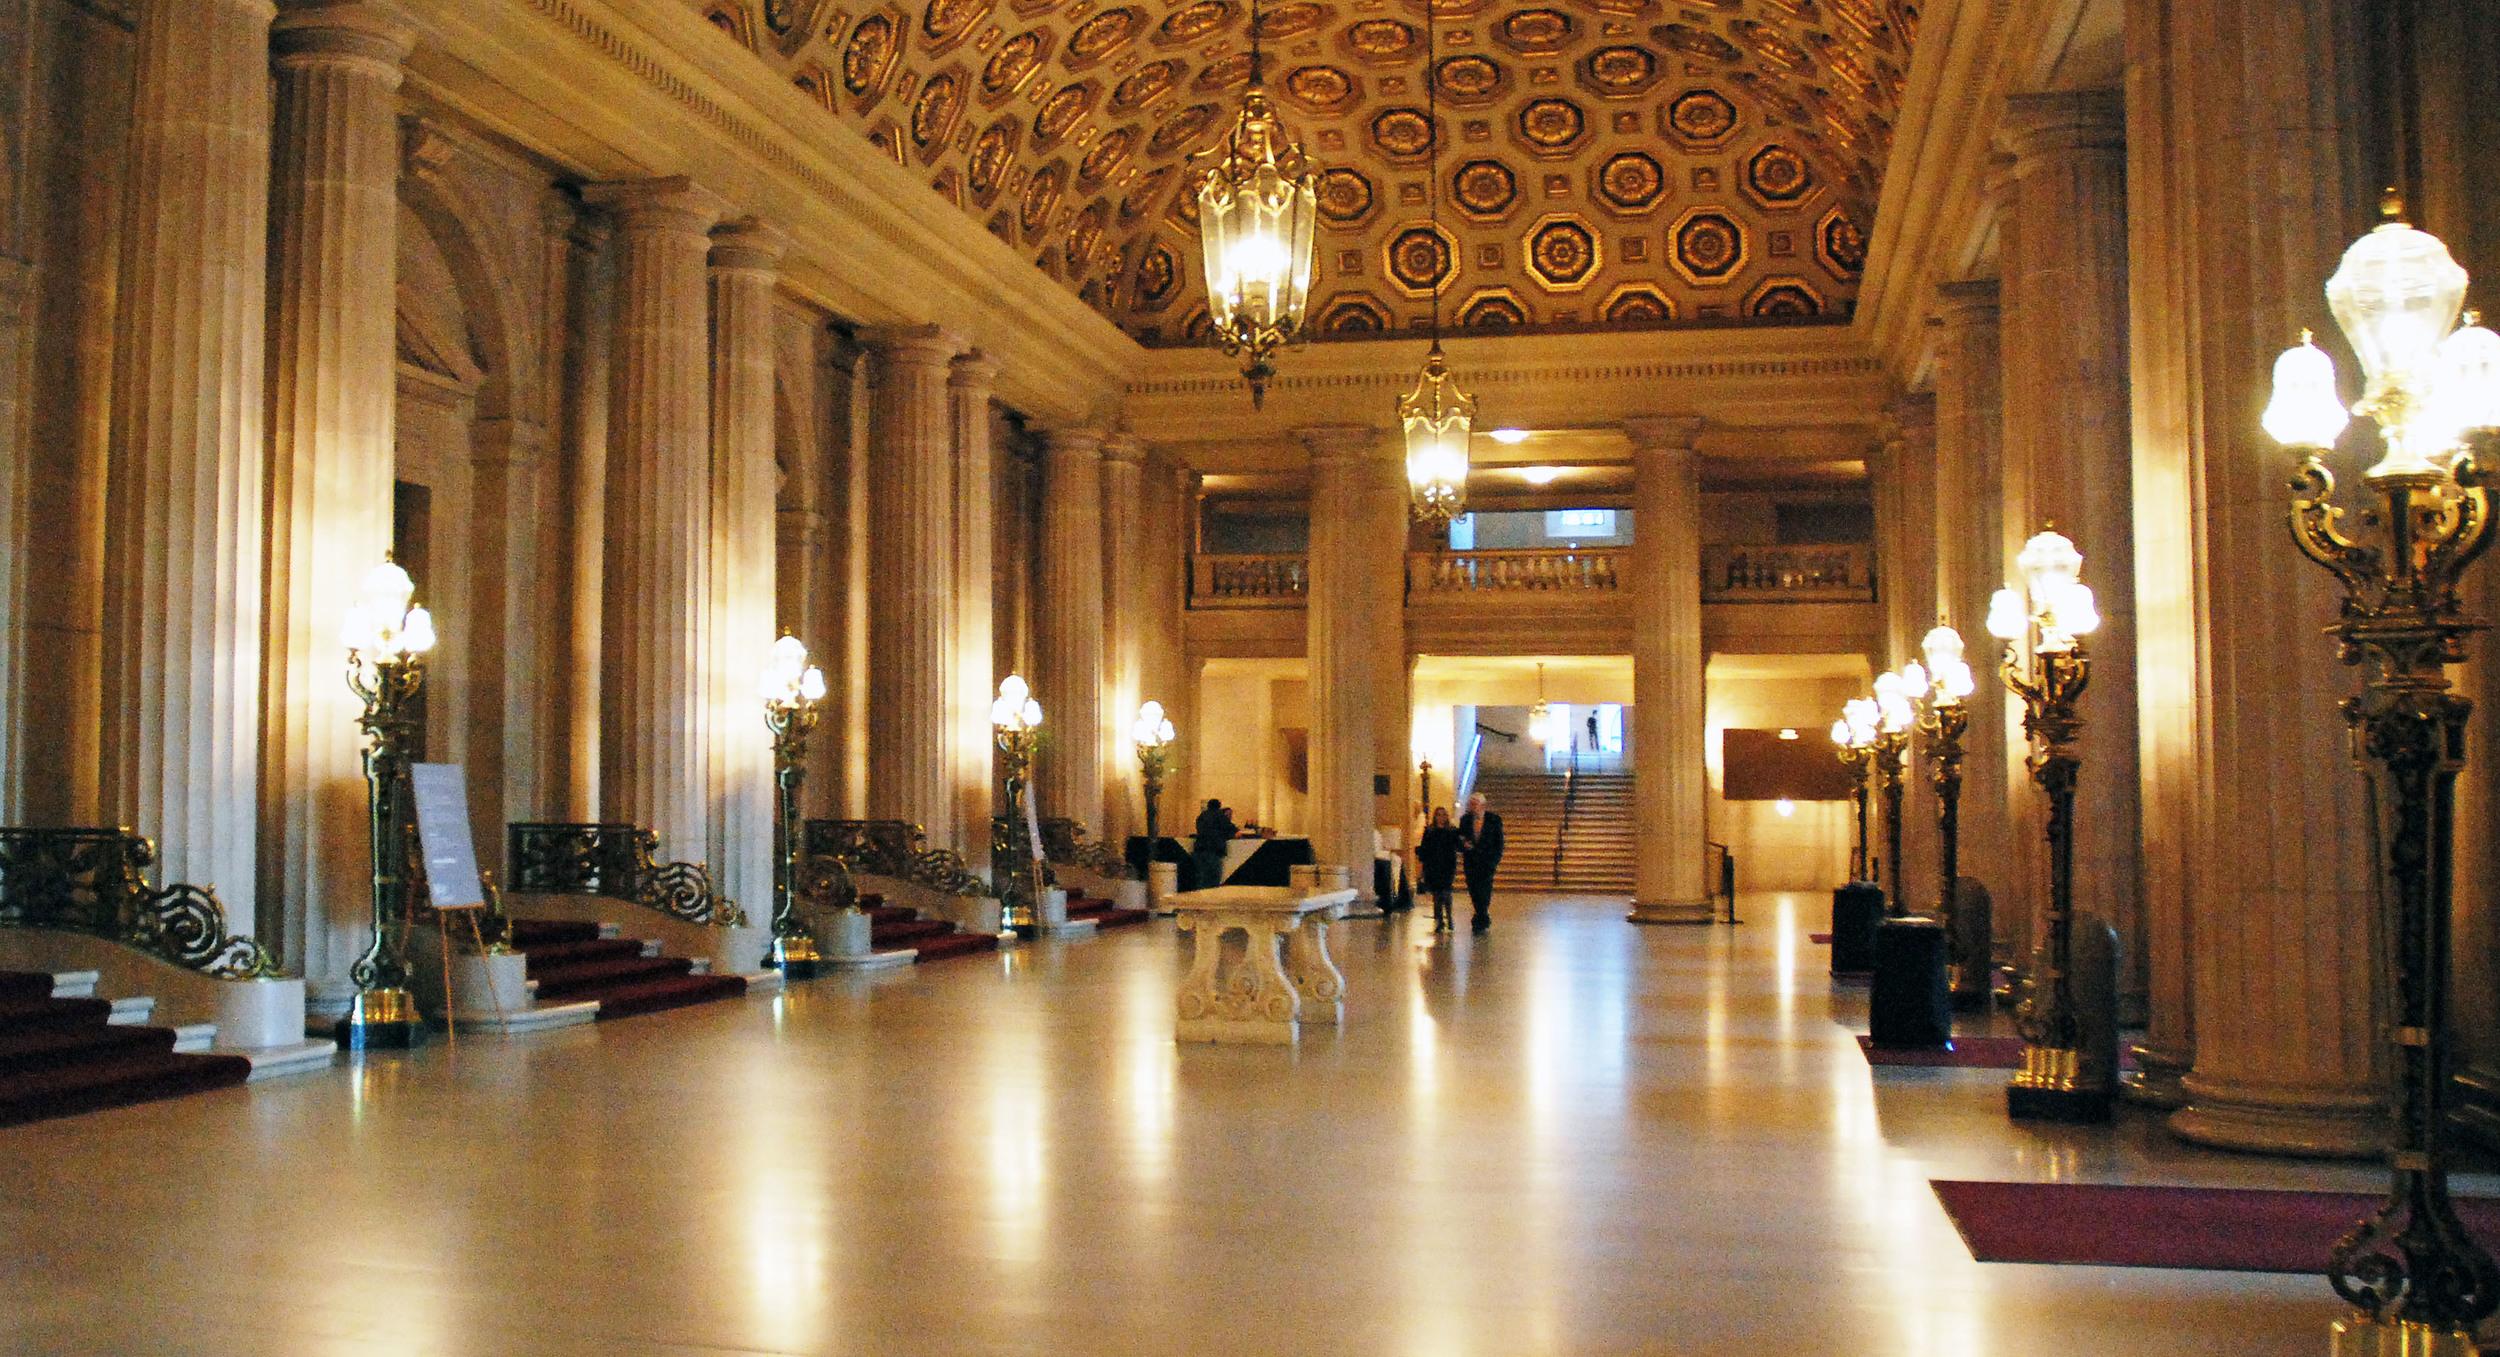 The Lineup - Opera House